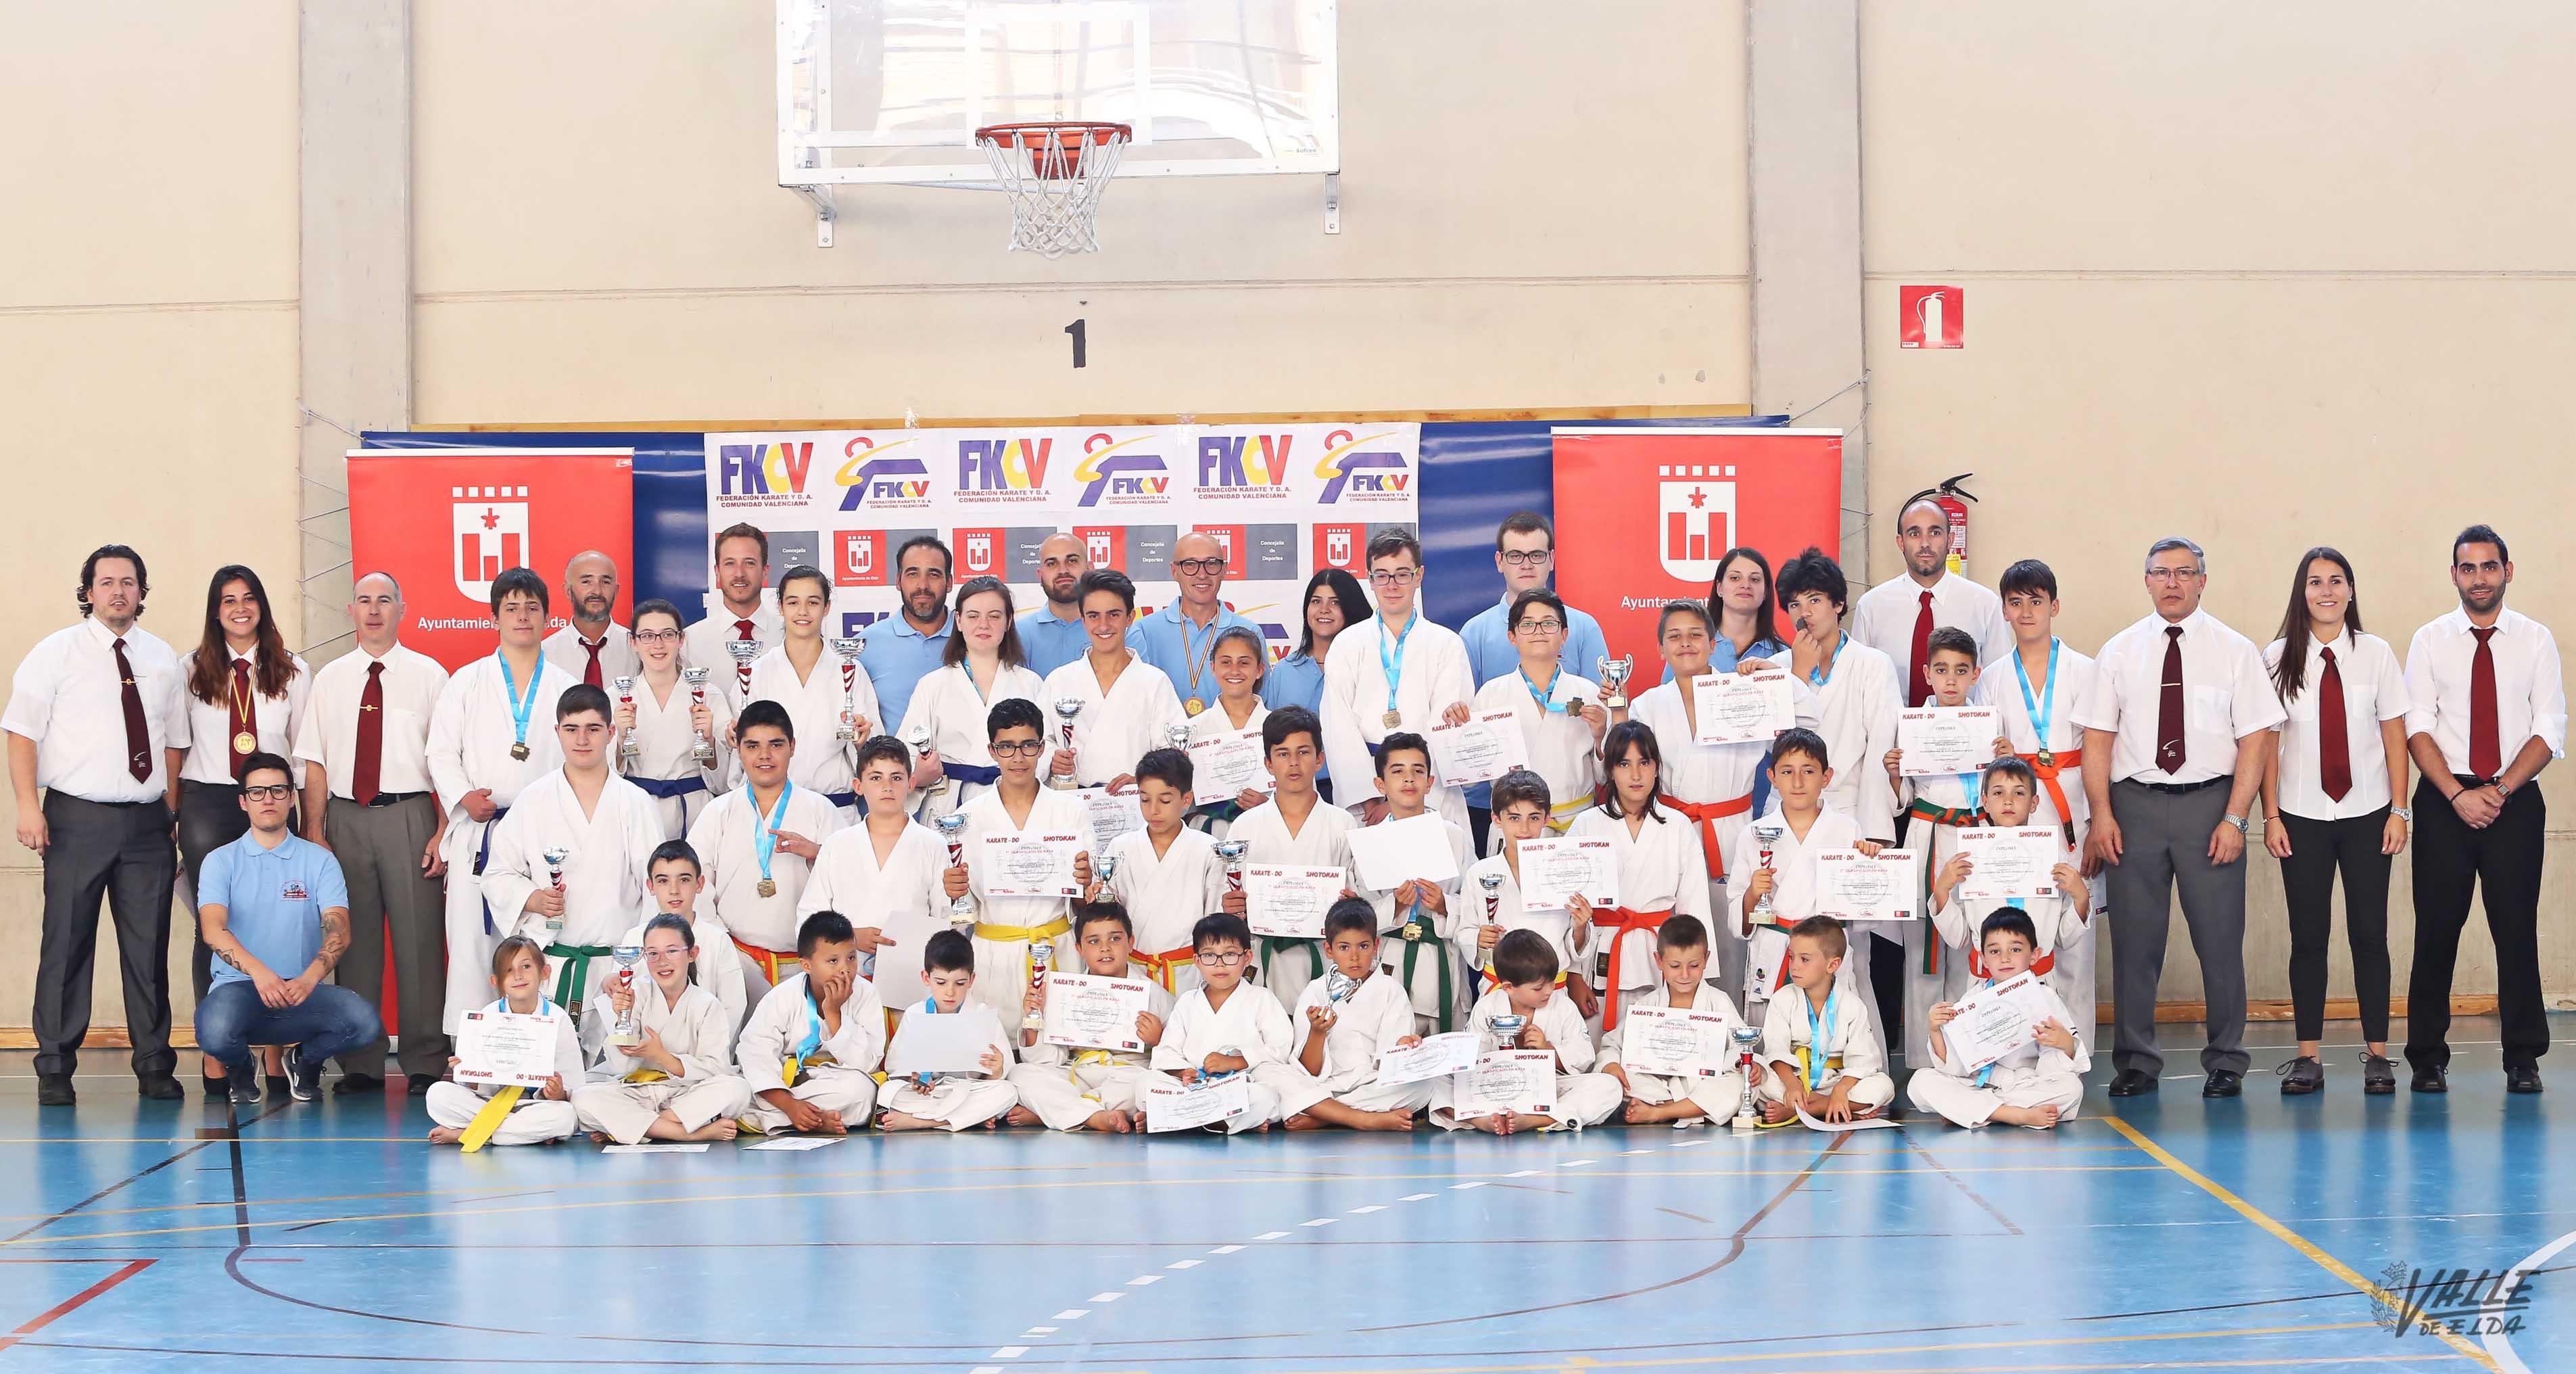 La Escuela Municipal de Karate se pone a prueba 0 (0)